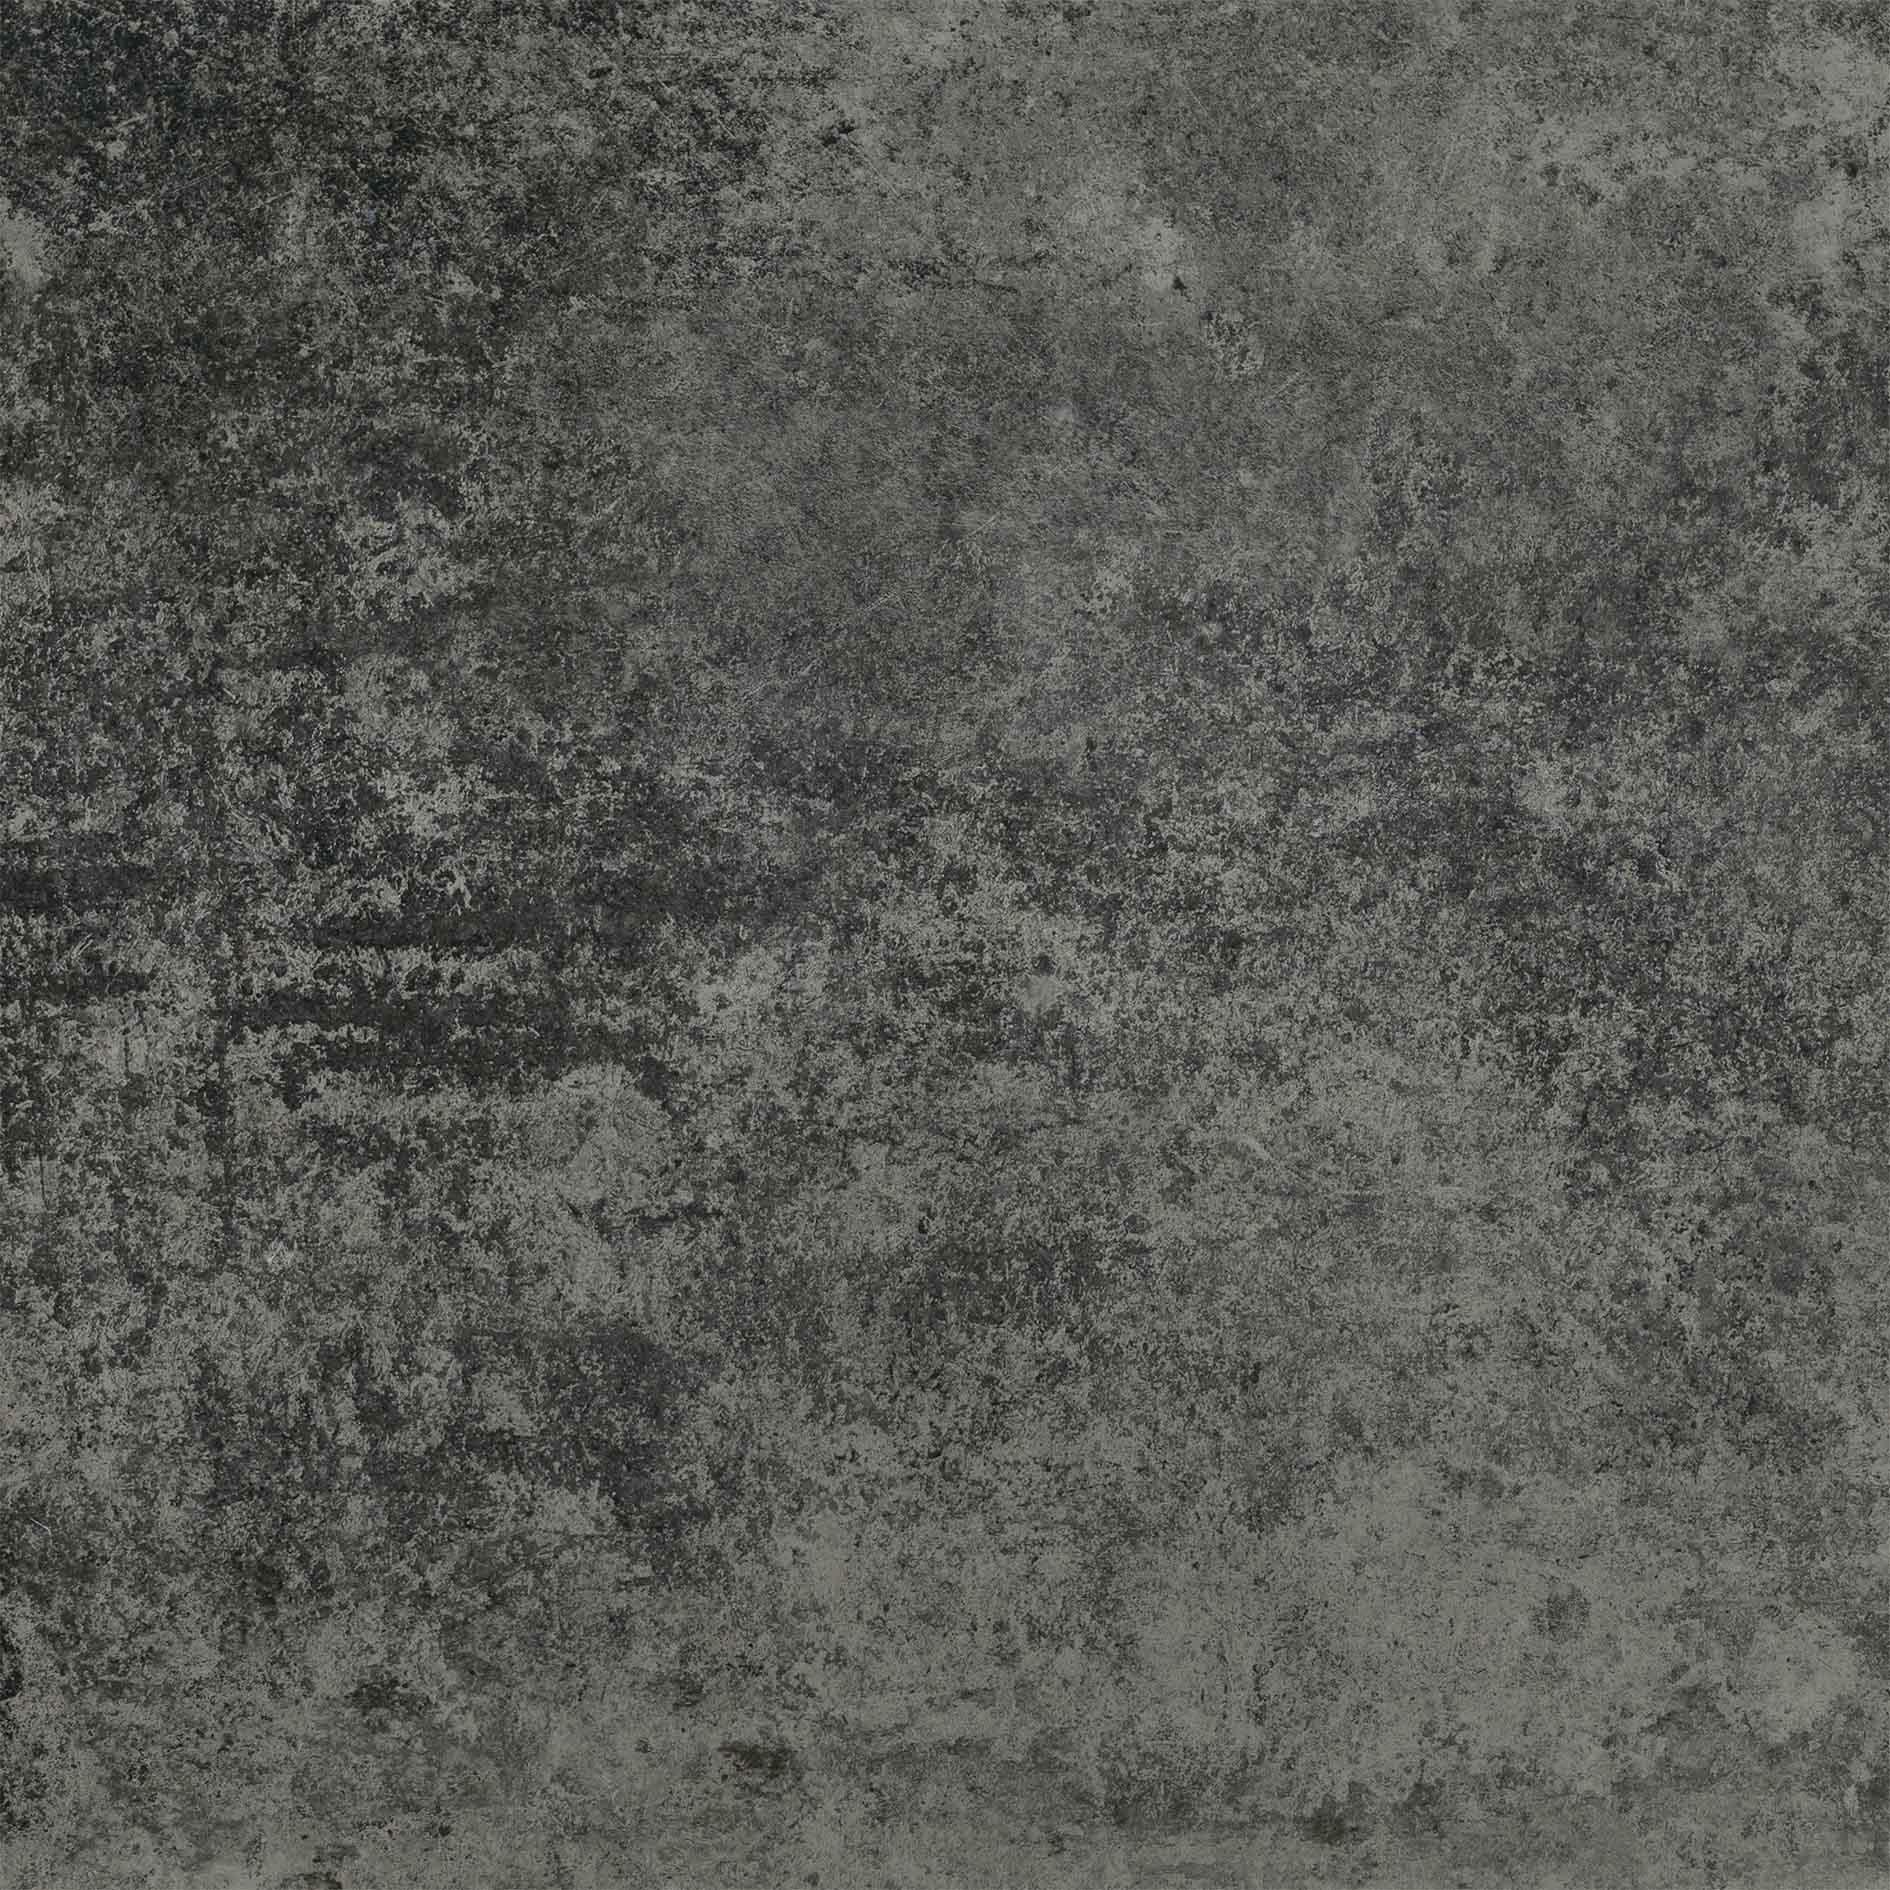 Artifact Worked Charcoal Matte 10mm 80 x 80